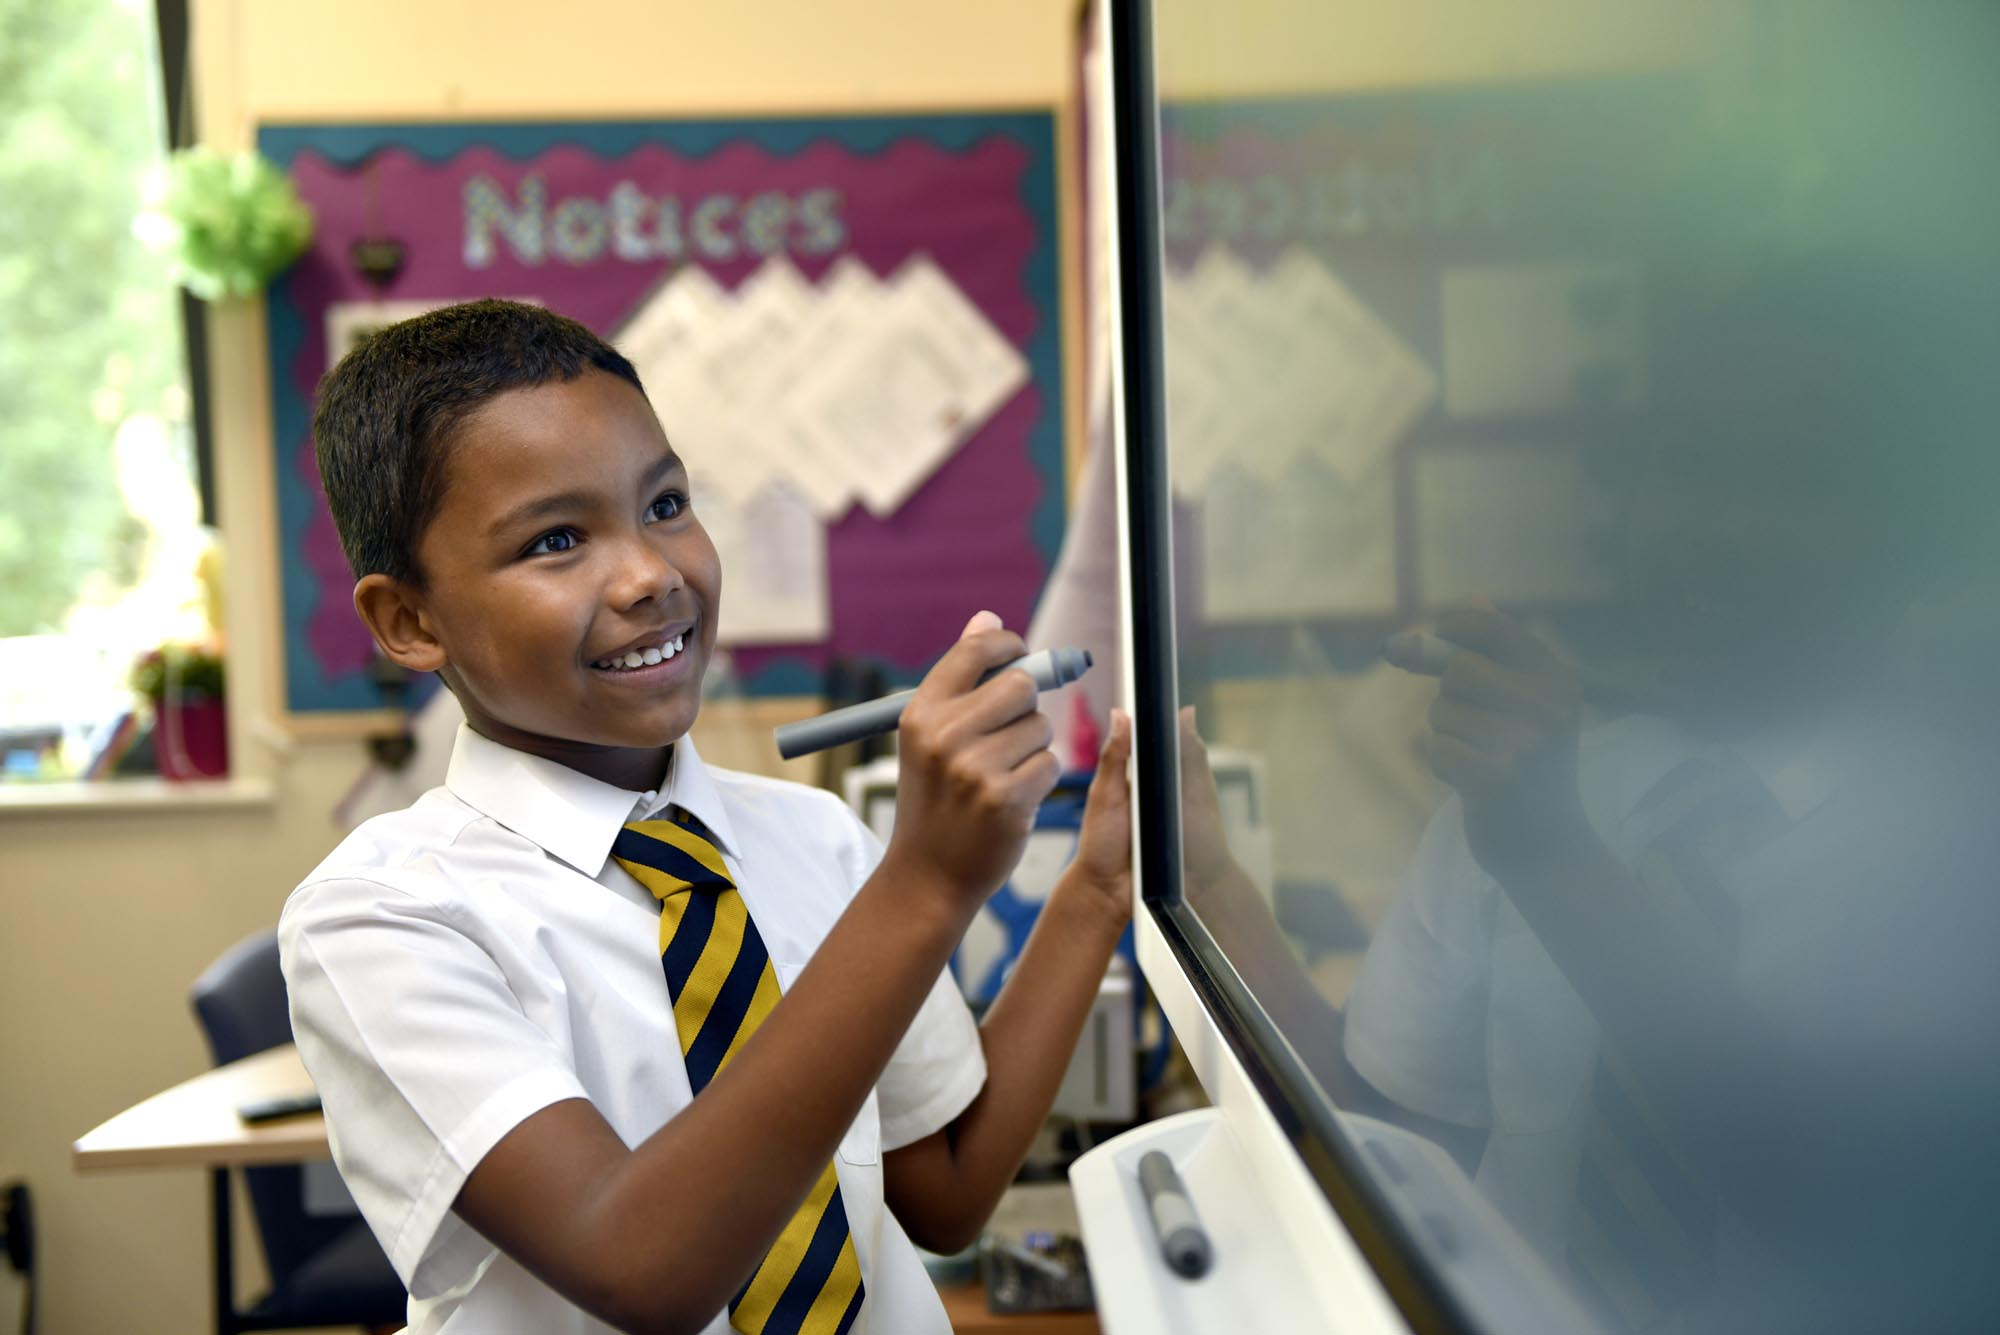 Boy writing on interactive board